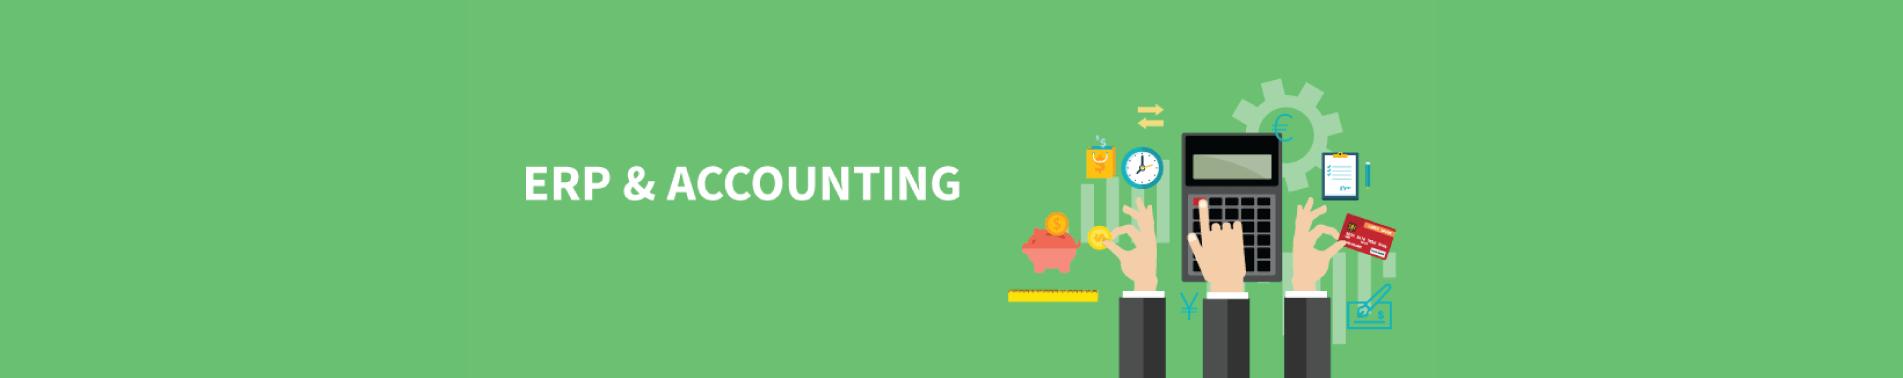 ERP & Accounting